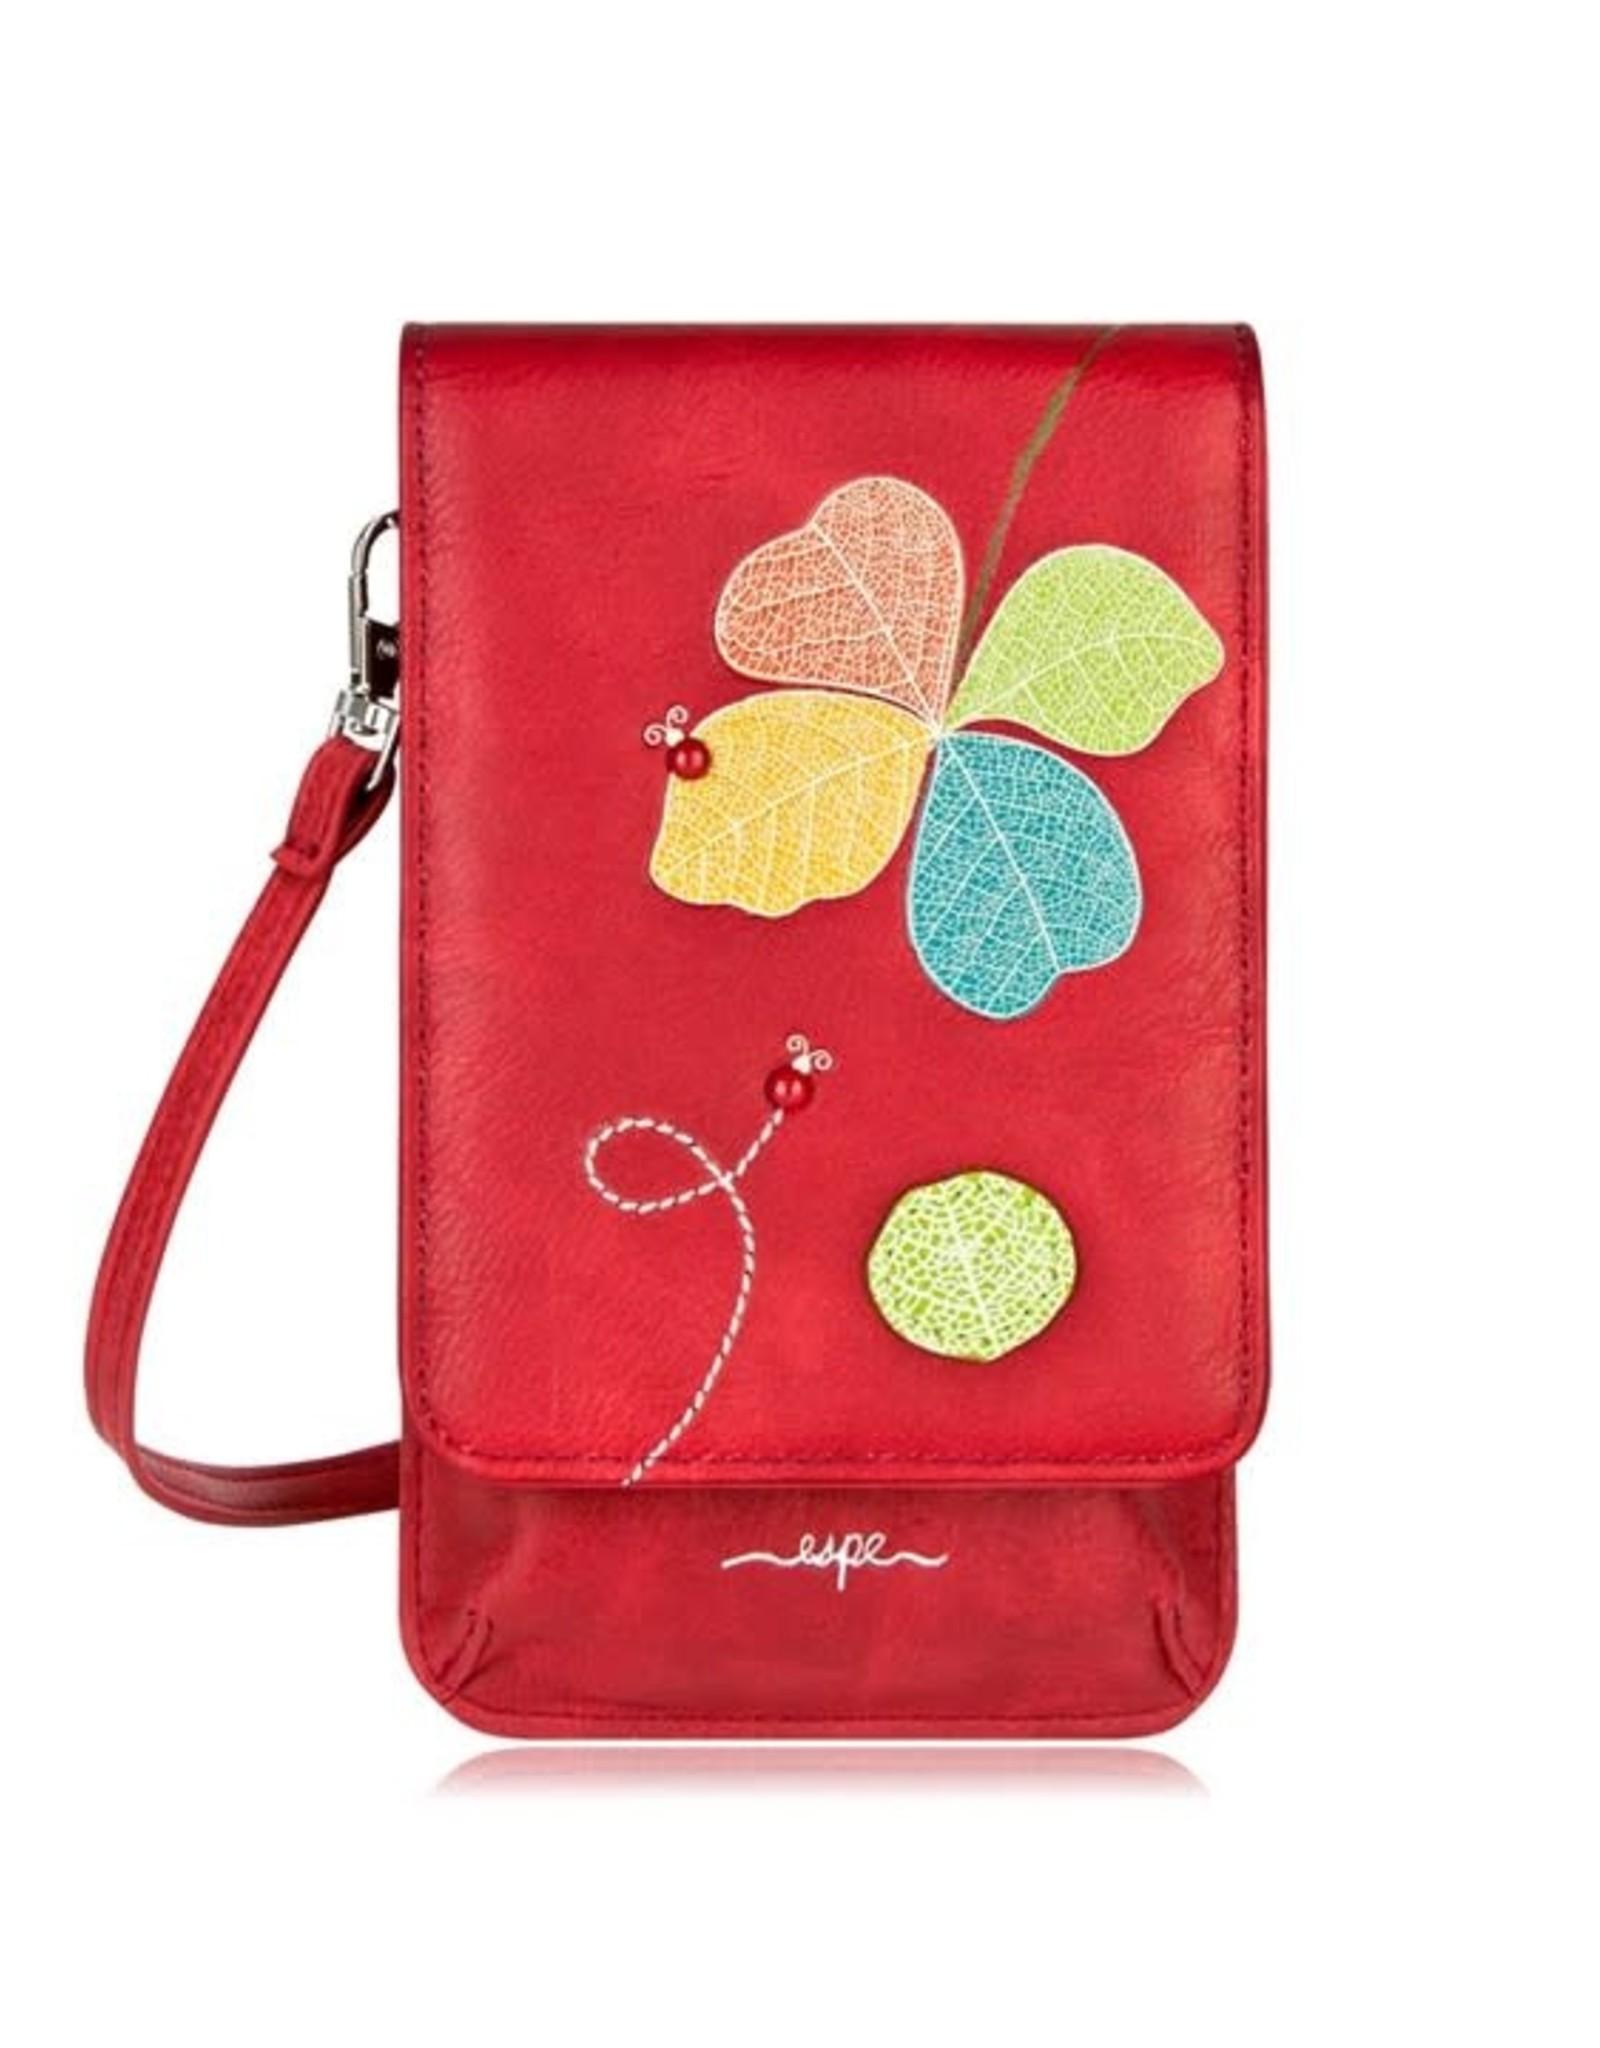 ESPE Scarlet mini - Rouge